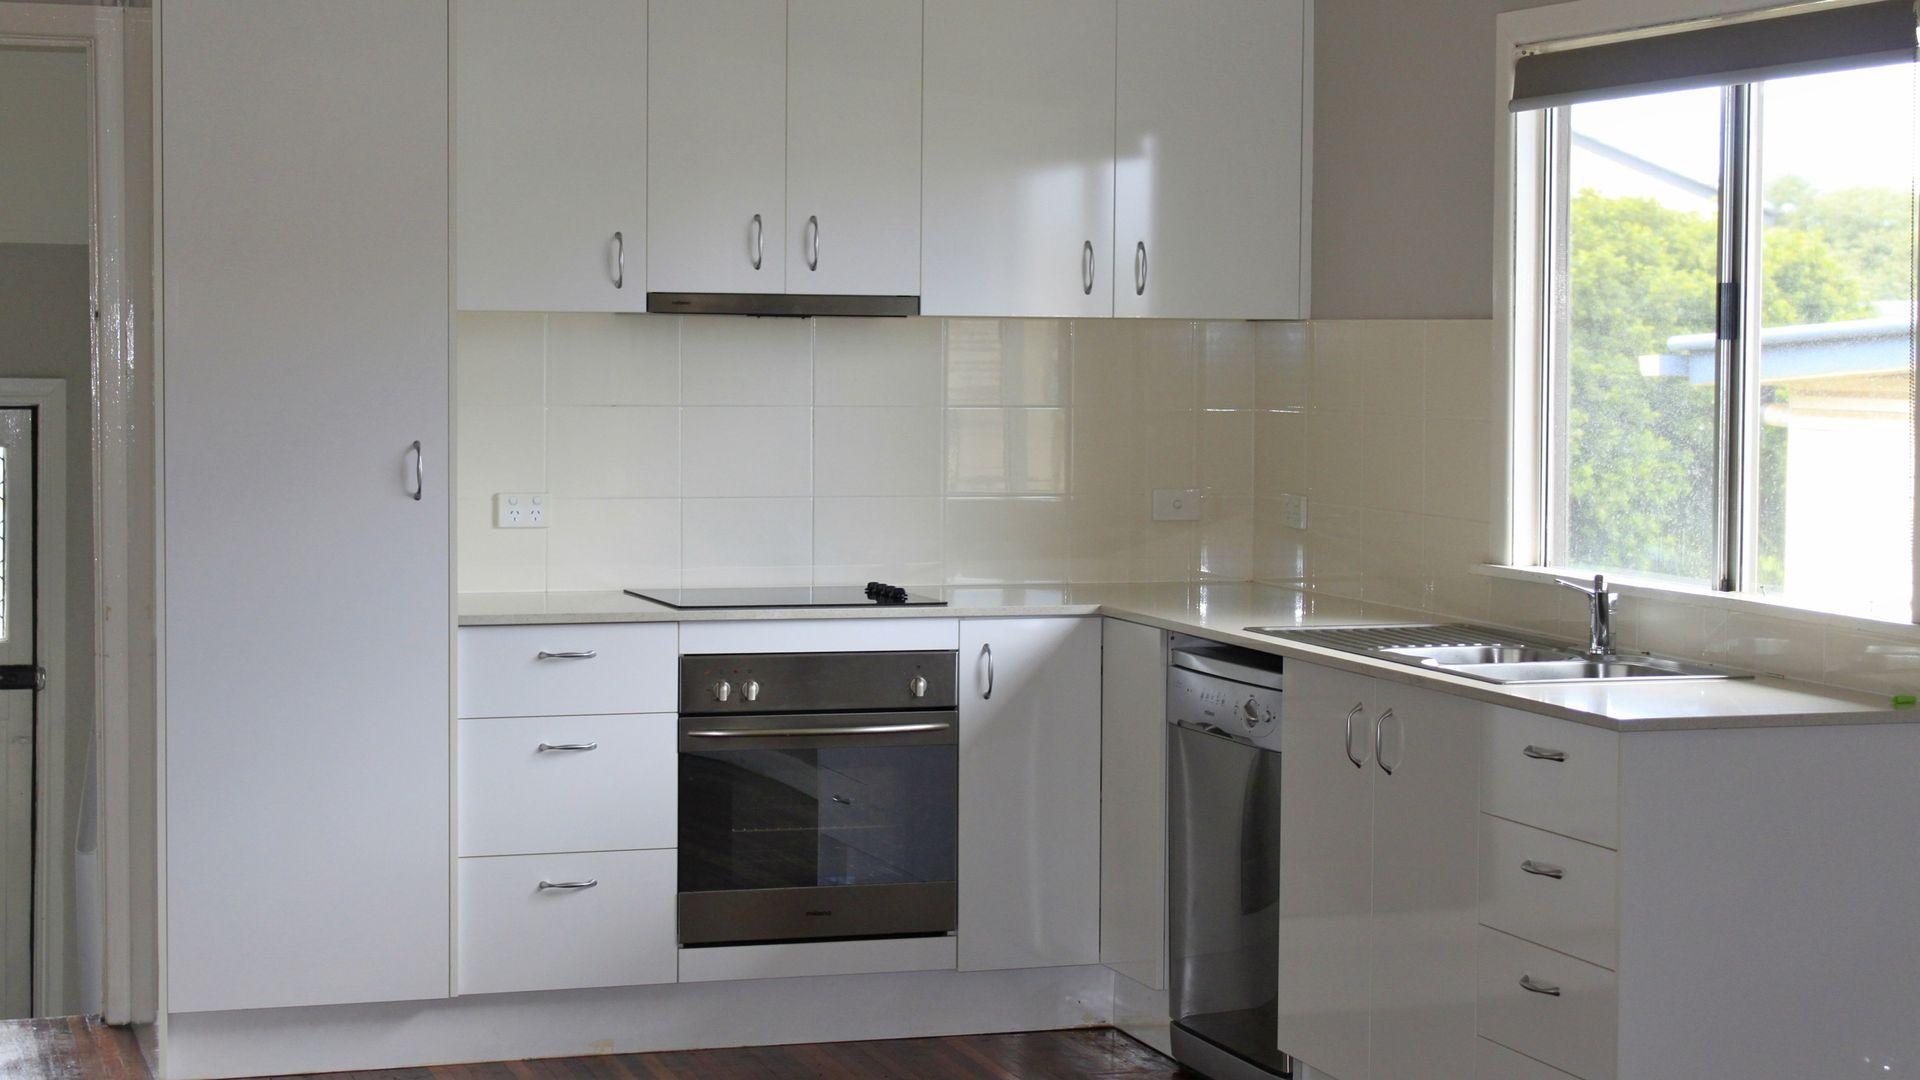 54 Lindwall Street, Upper Mount Gravatt QLD 4122, Image 1